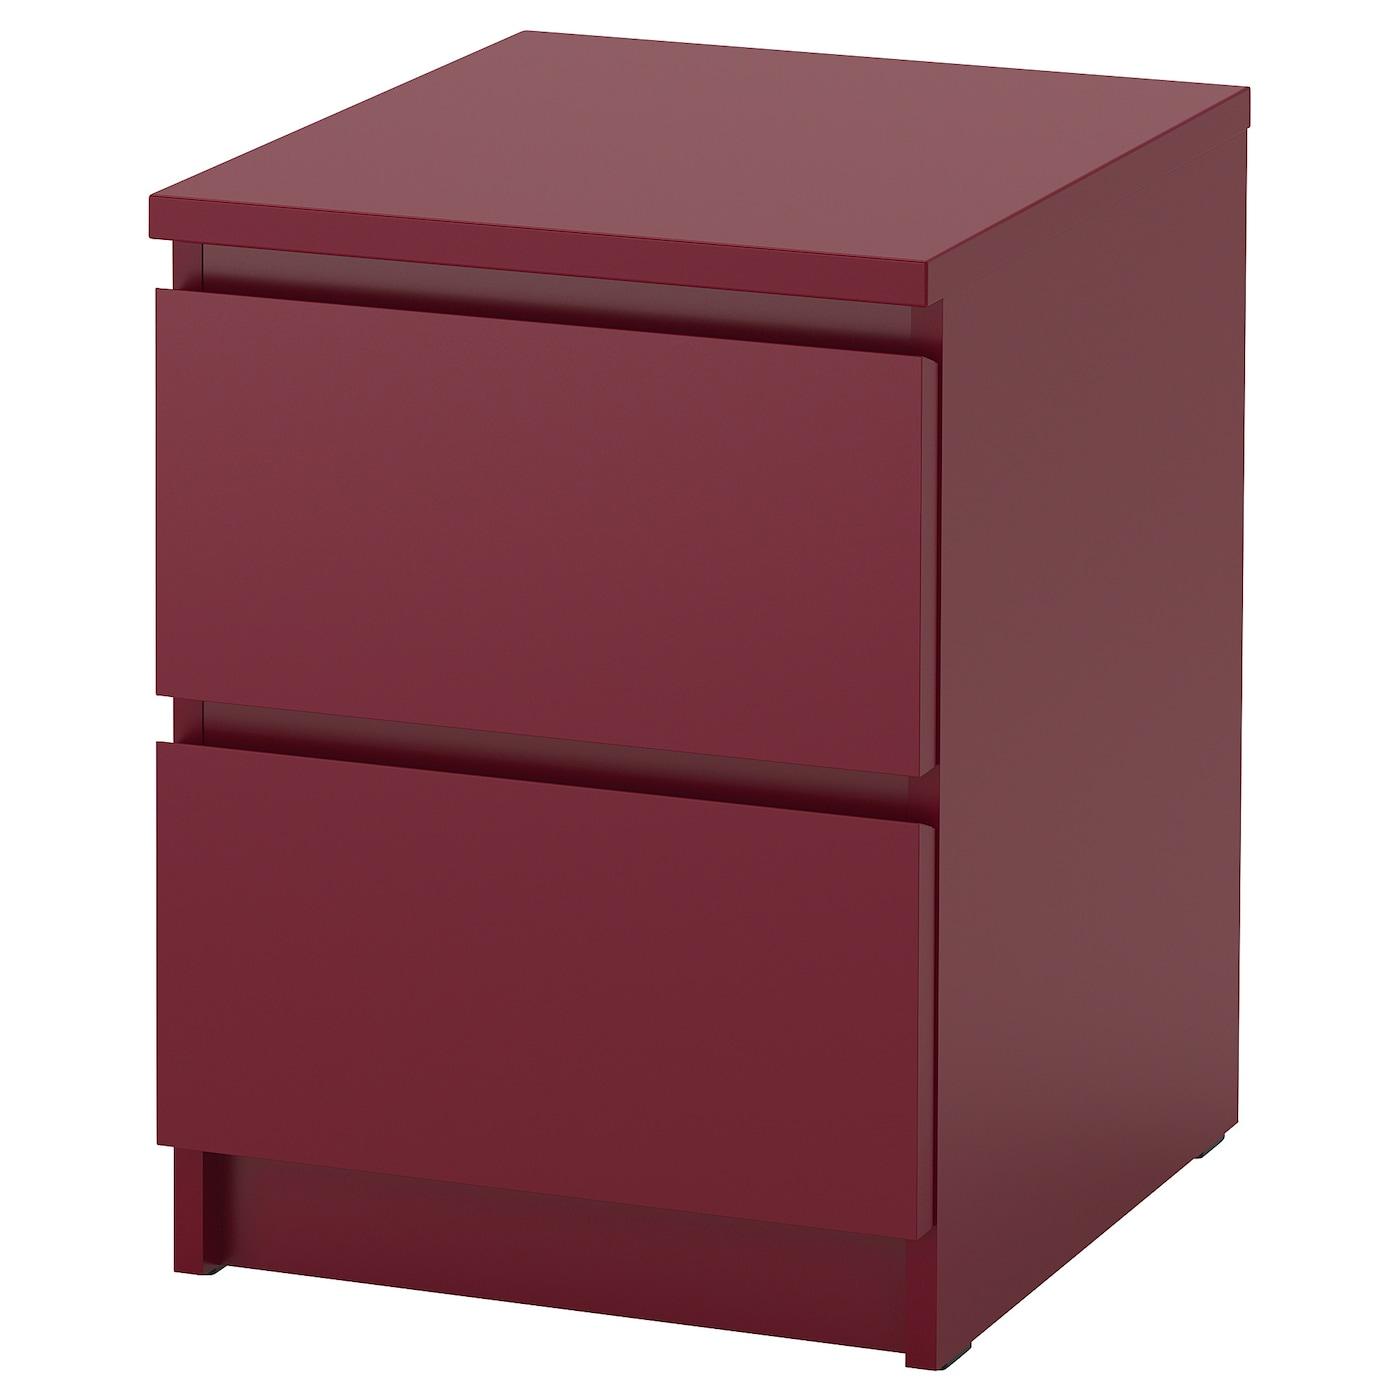 IKEA - MALM Ladekast 2 lades - 40x55 cm - Donkerrood